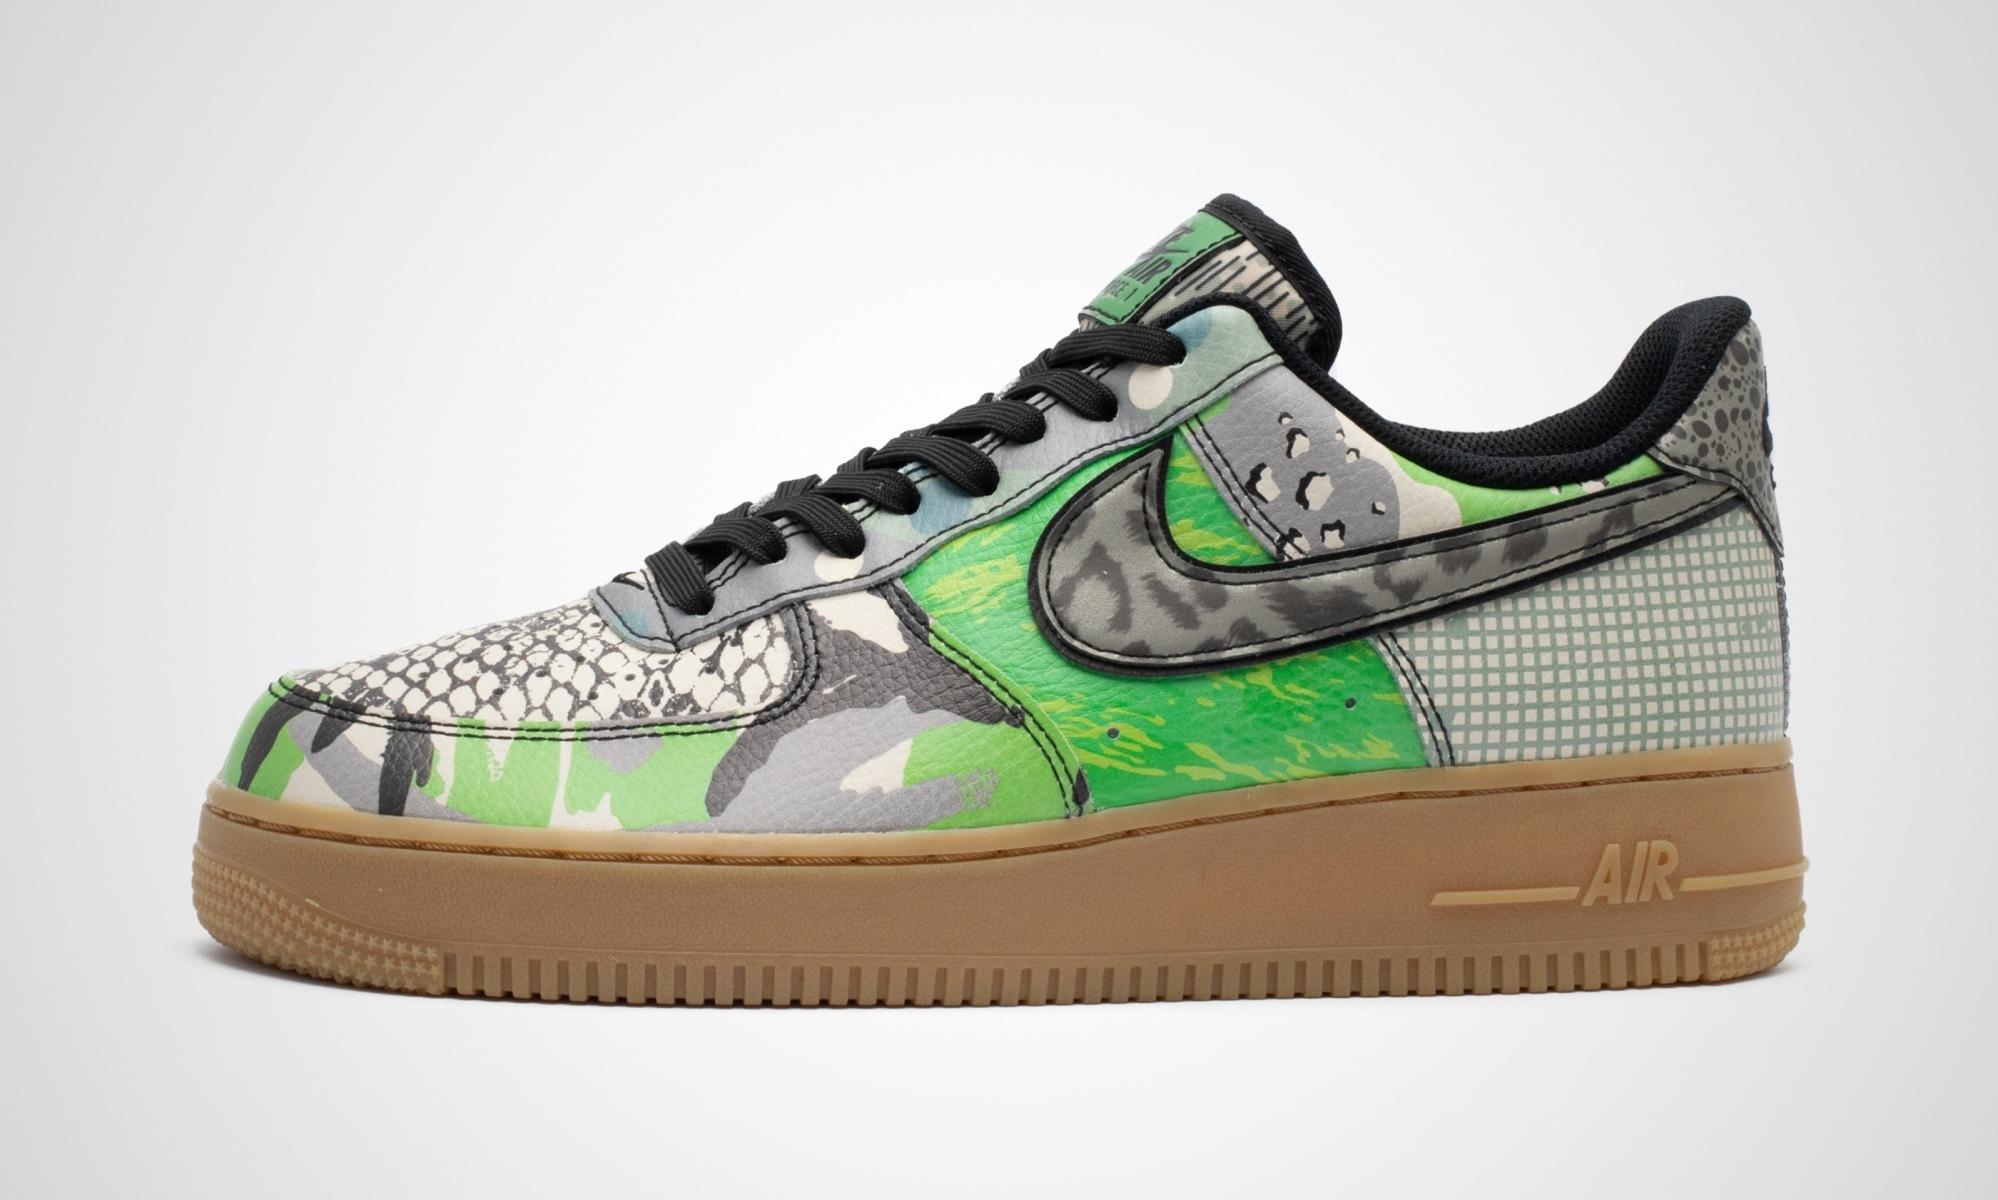 Nike Air Force 1 City of Dreams